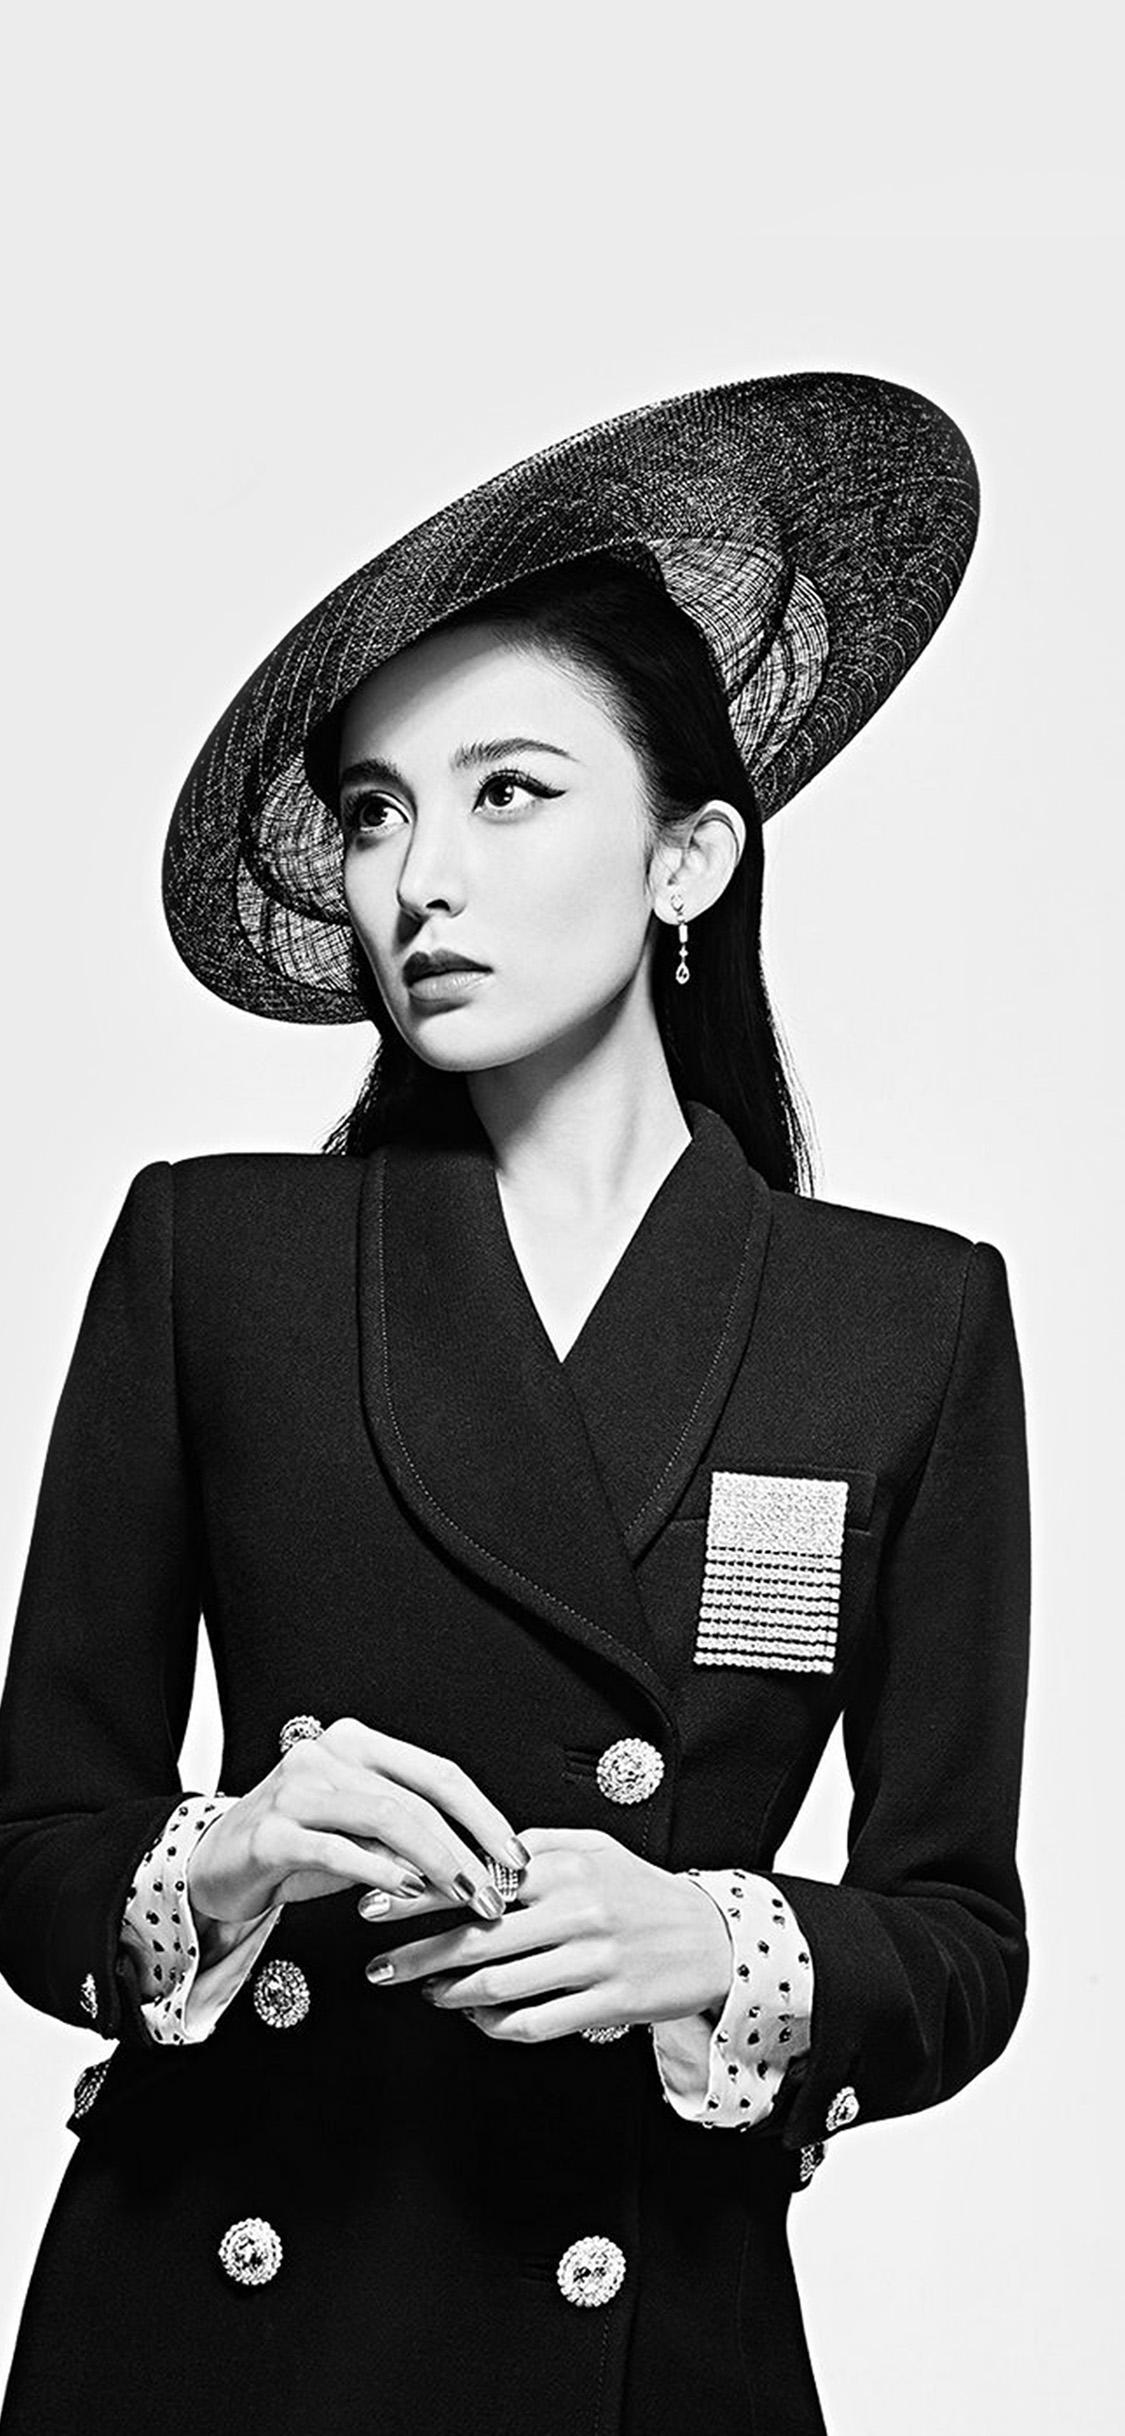 iPhonexpapers.com-Apple-iPhone-wallpaper-ht01-asian-girl-bw-model-film